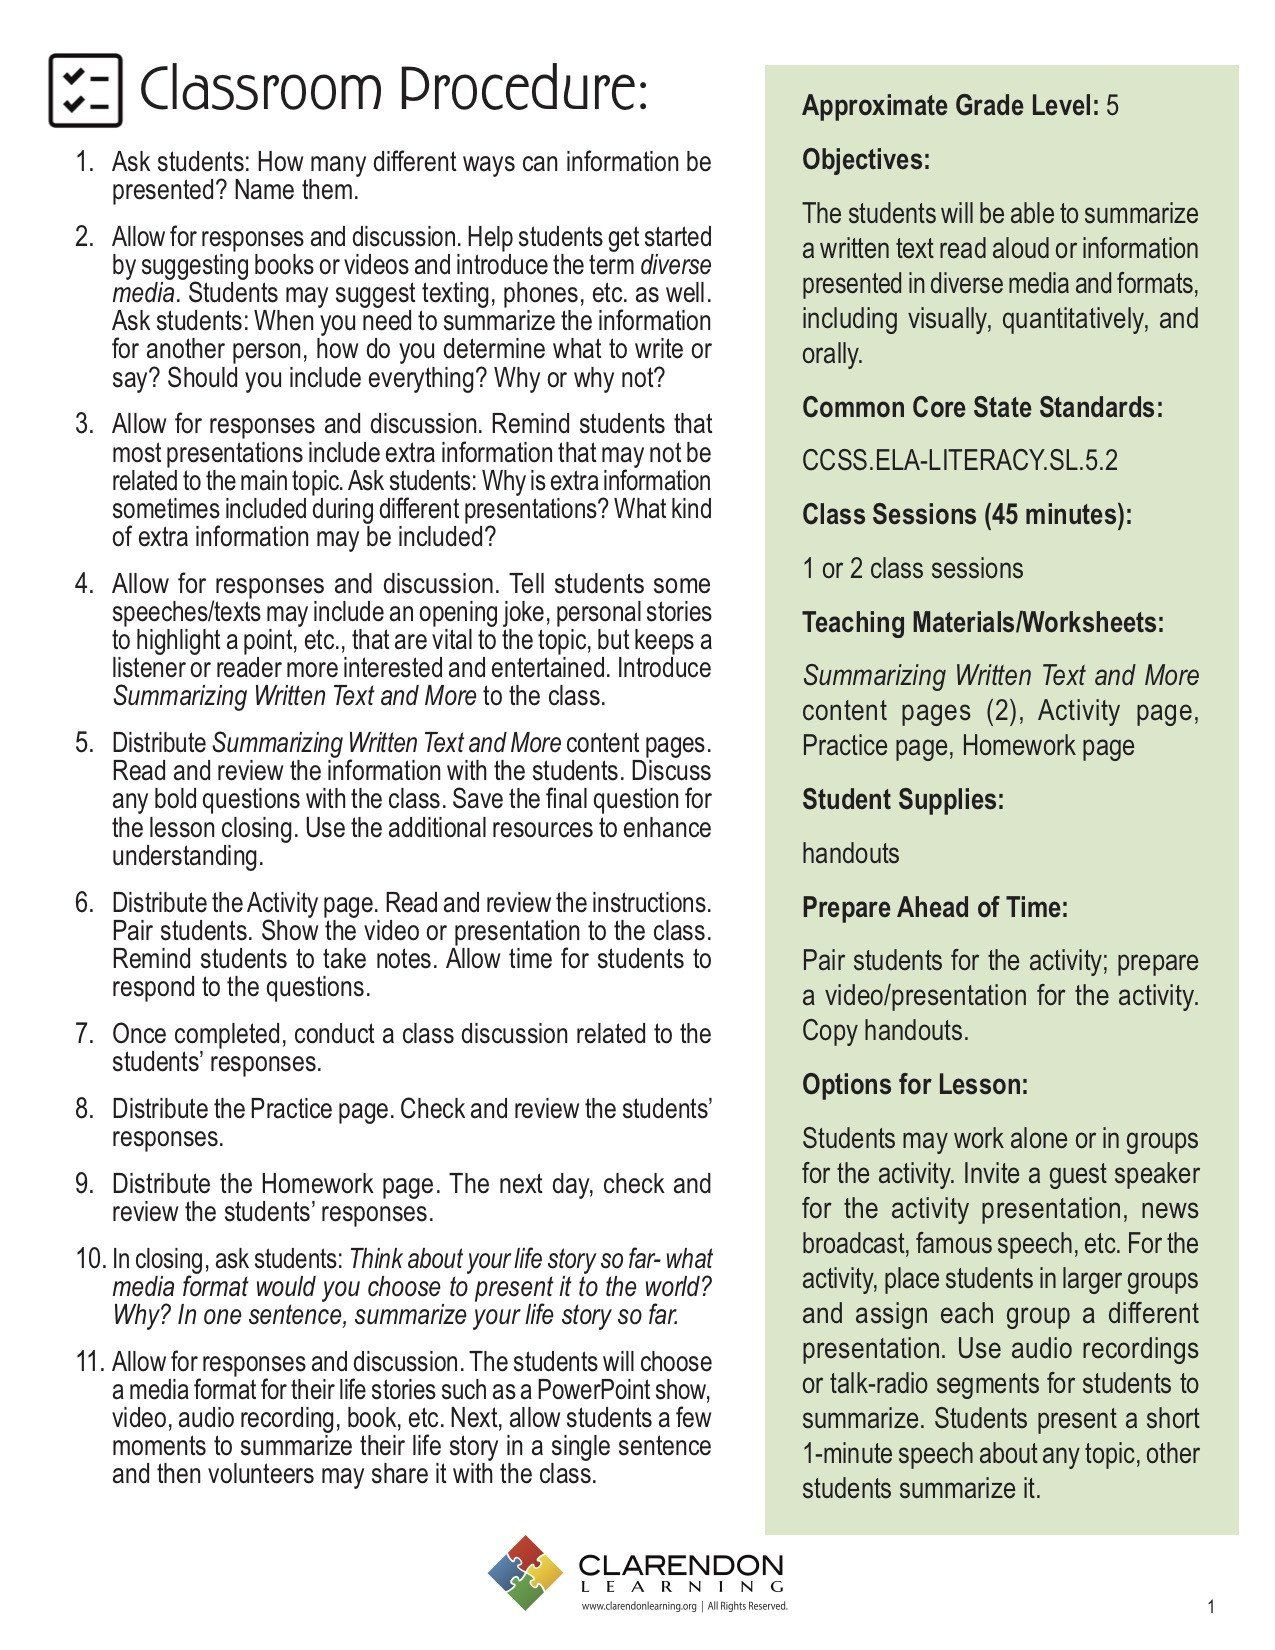 Summarizing Worksheet 3rd Grade Summarizing Written Text